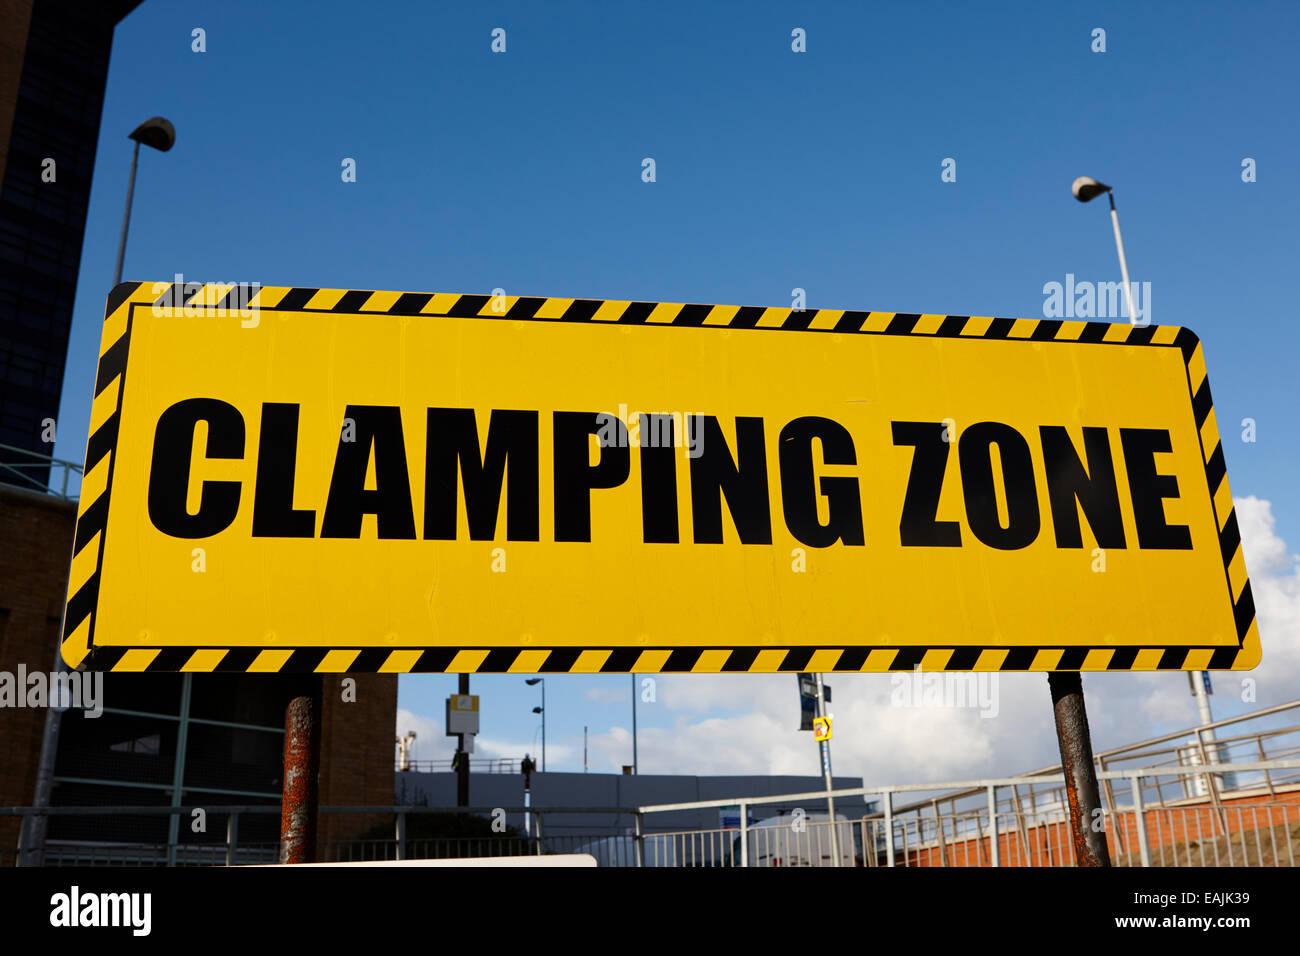 clamping zone signpost Belfast Northern Ireland - Stock Image